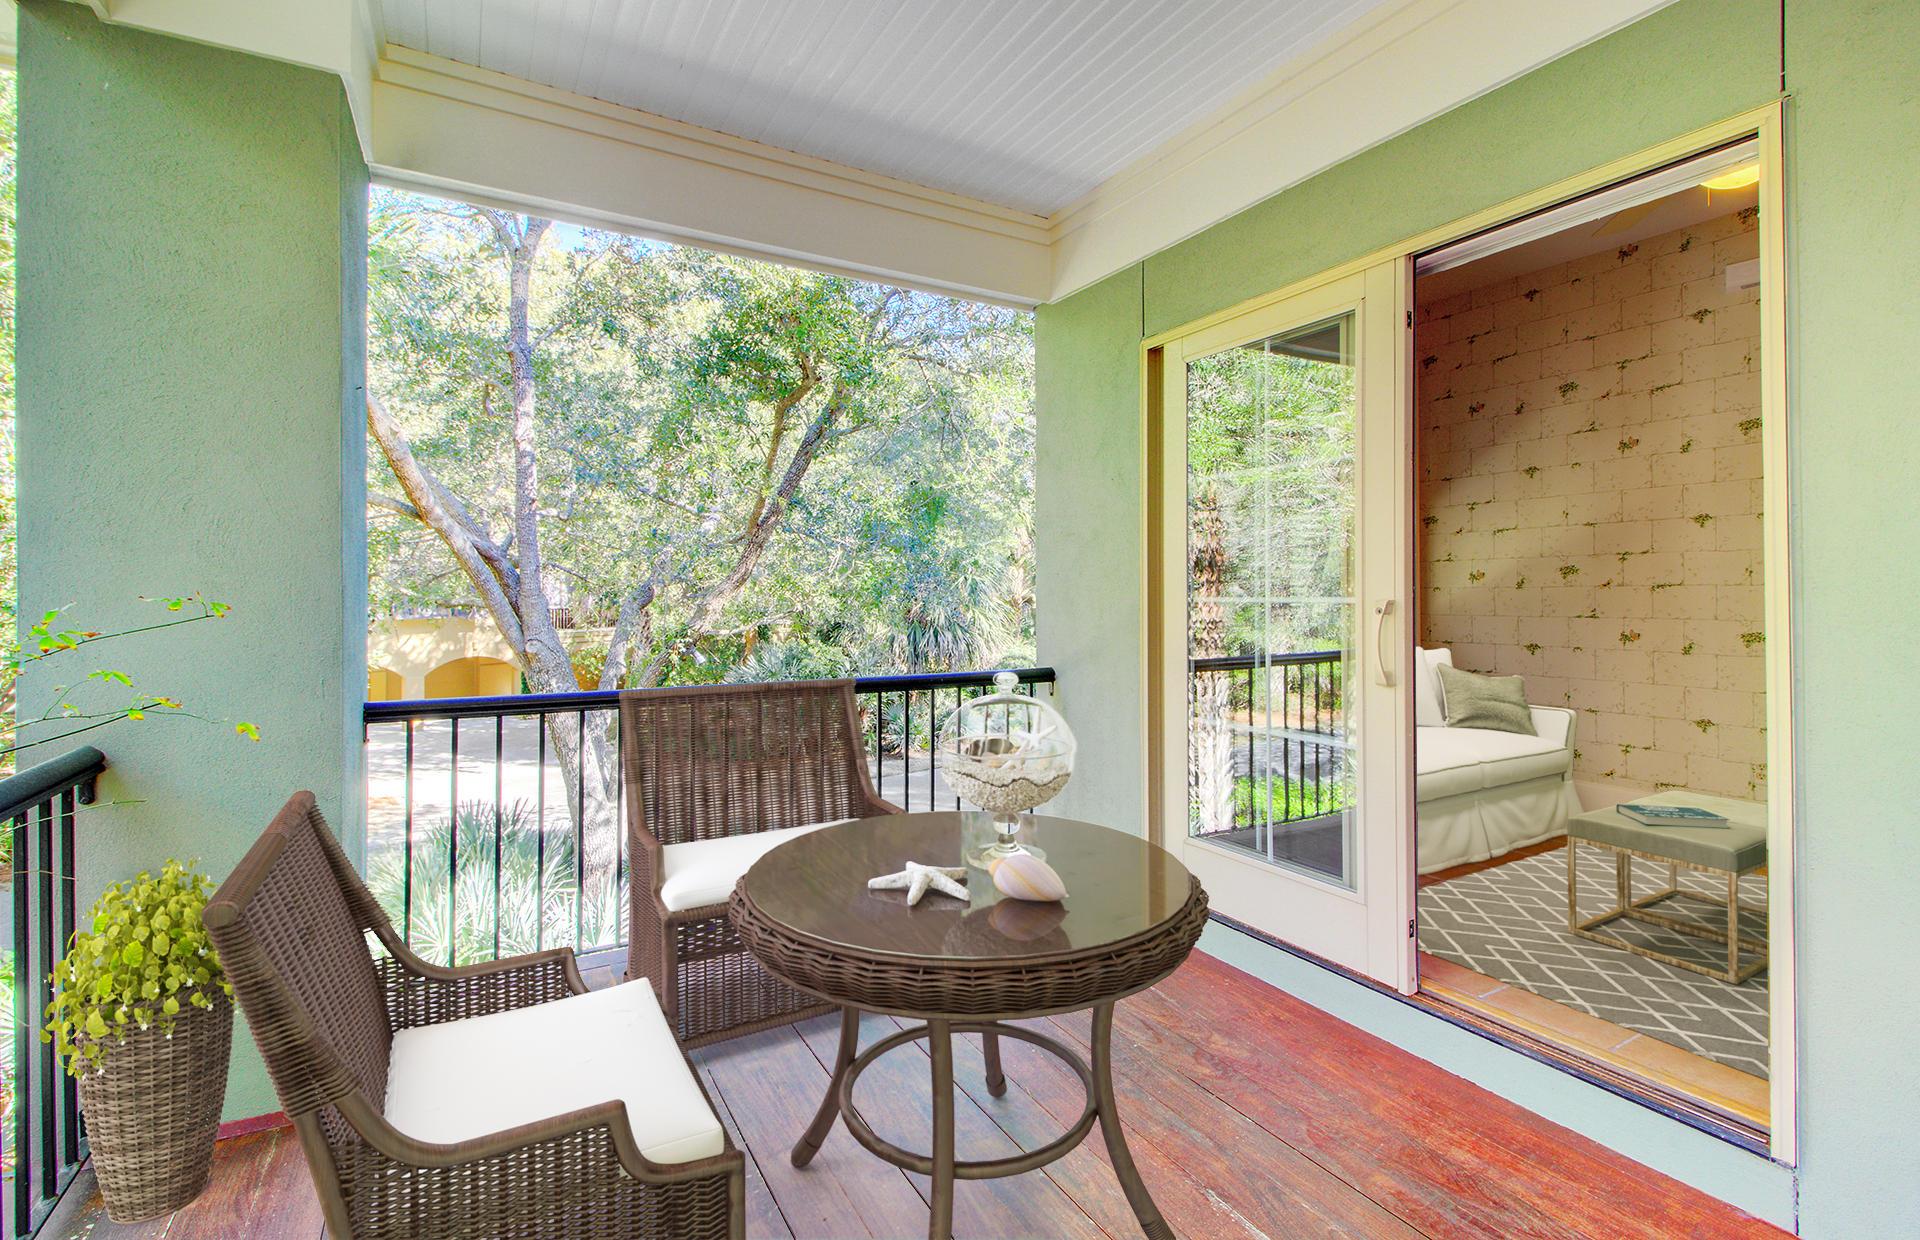 Kiawah Island Homes For Sale - 402 Ocean Oaks, Kiawah Island, SC - 24